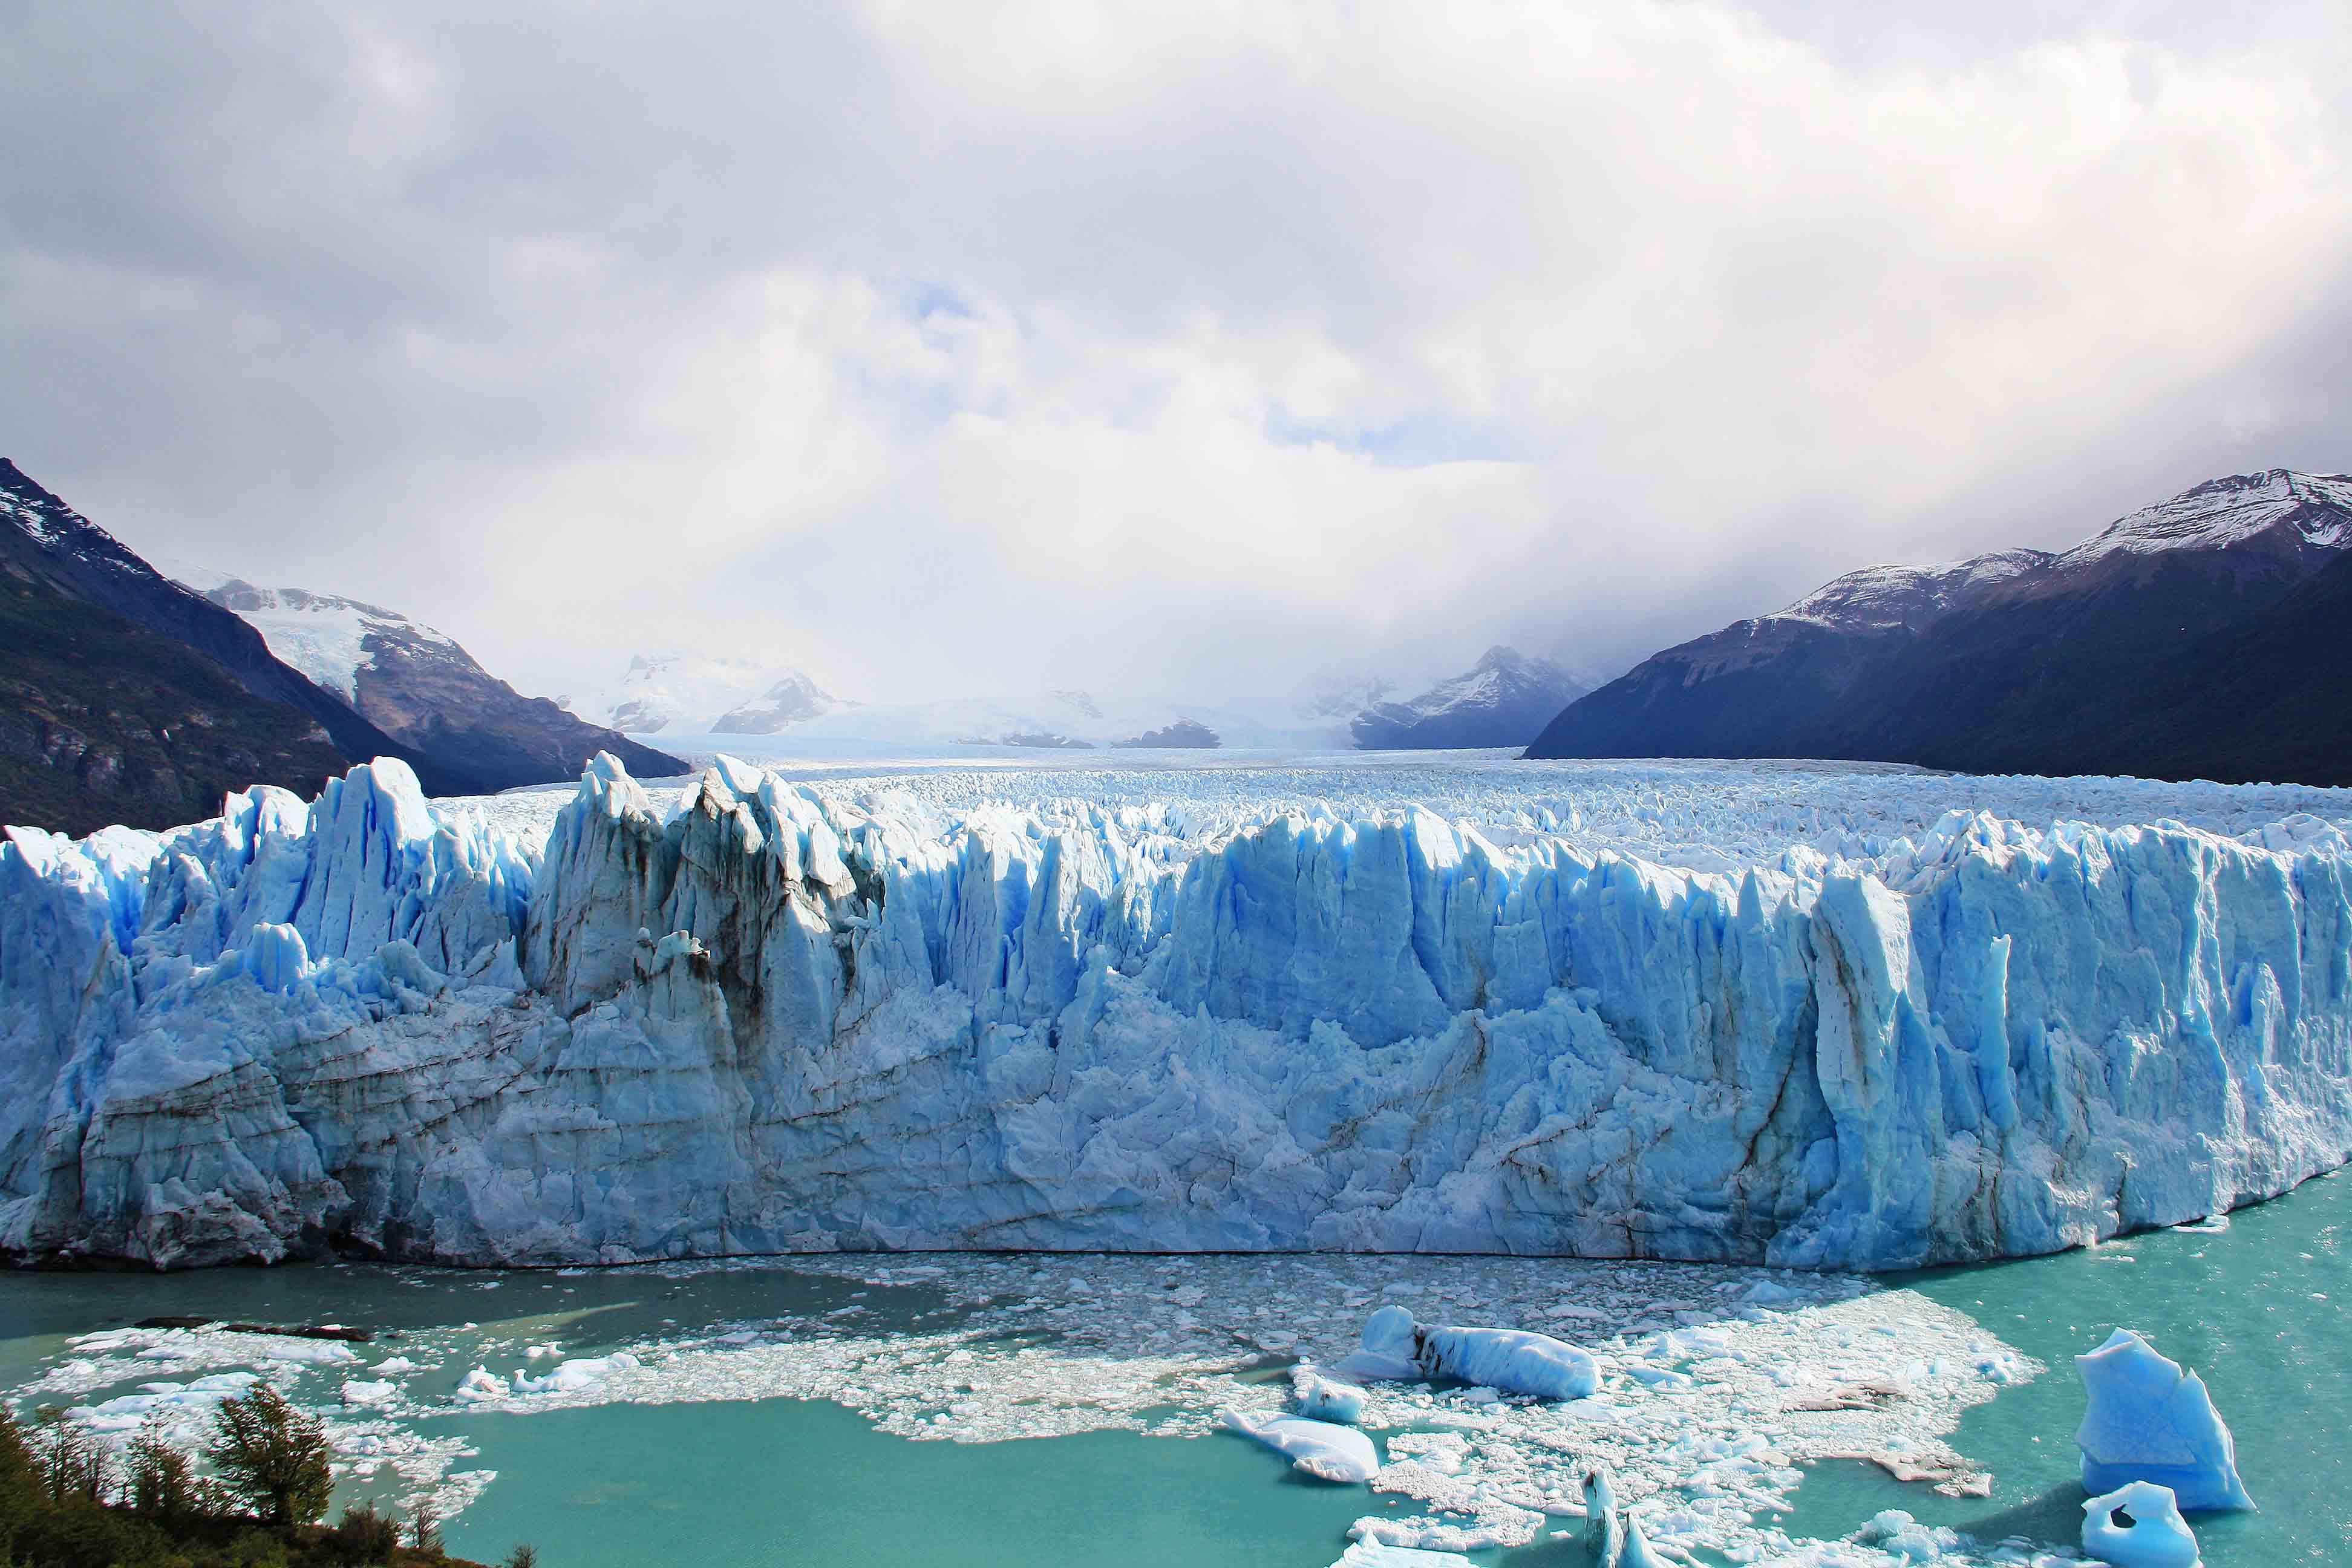 perito moreno glacier el calafate argentina south america